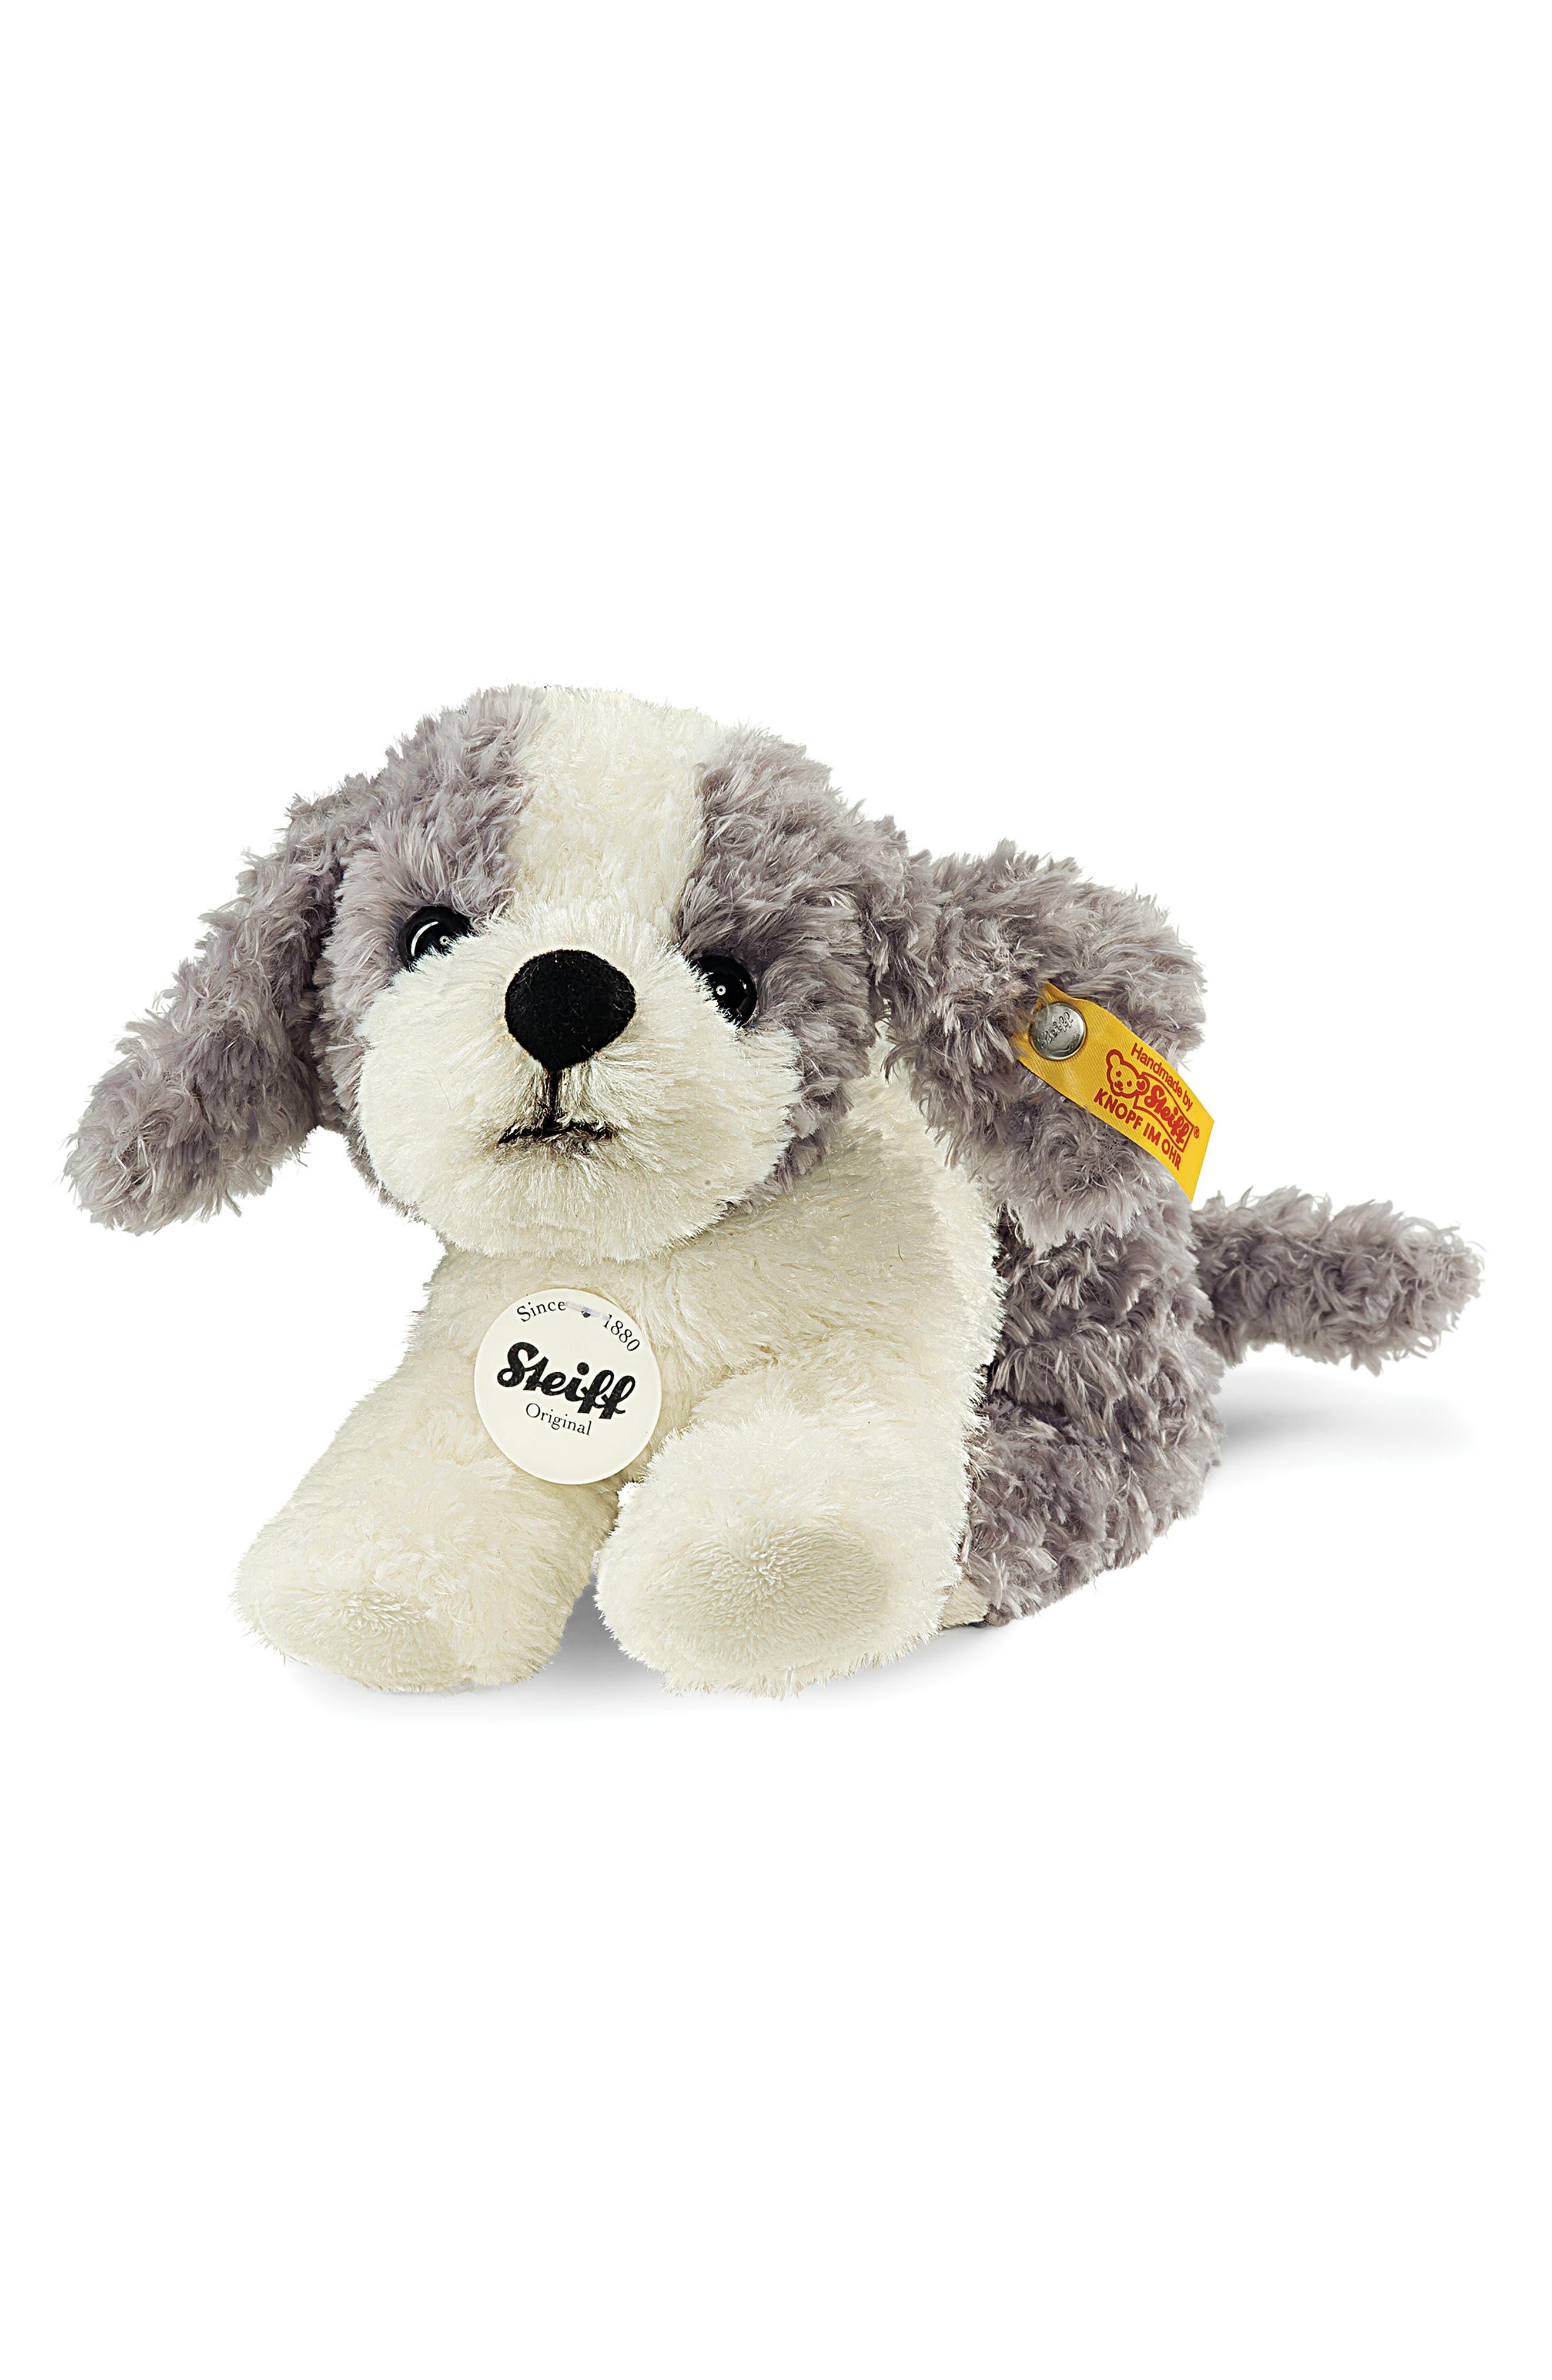 Steiff Little Tommy Puppy Stuffed Animal